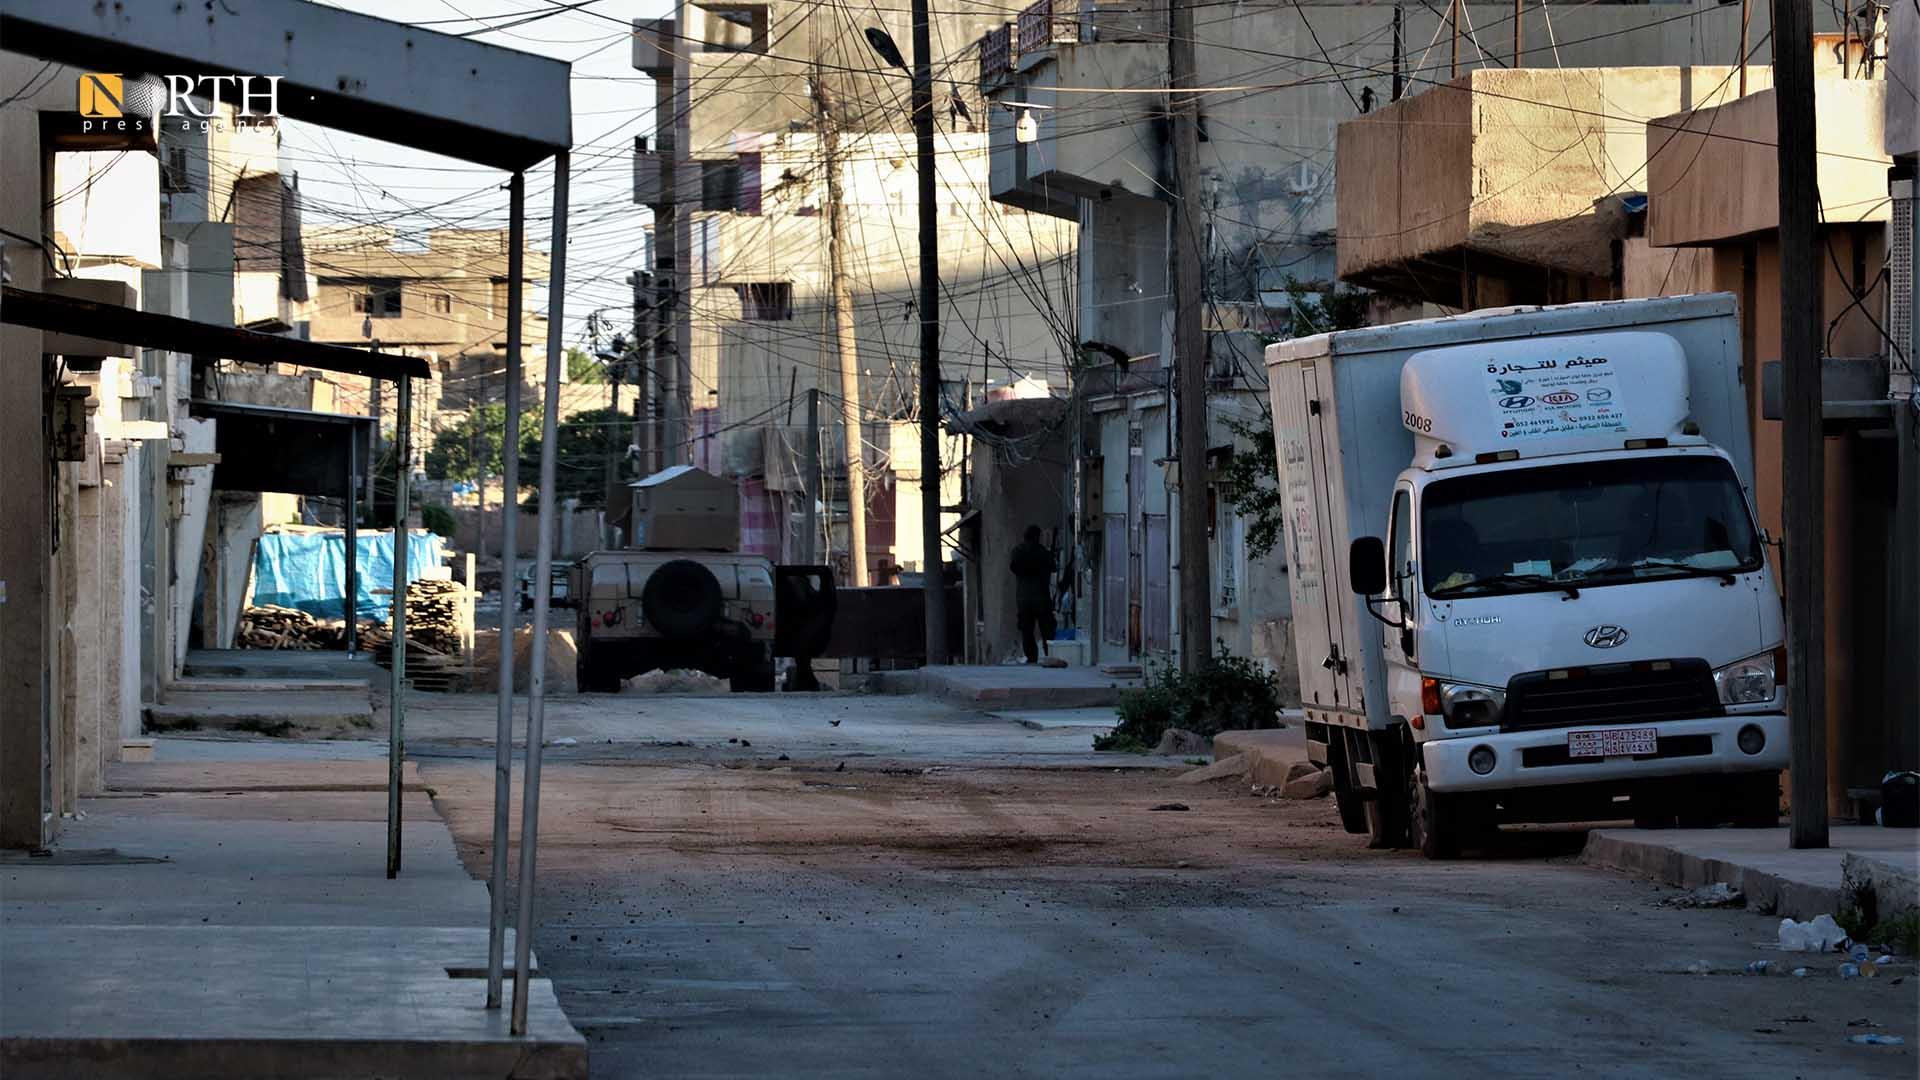 Asayish members deploy inside al-Tai neighborhood in Qamishli – North Press.